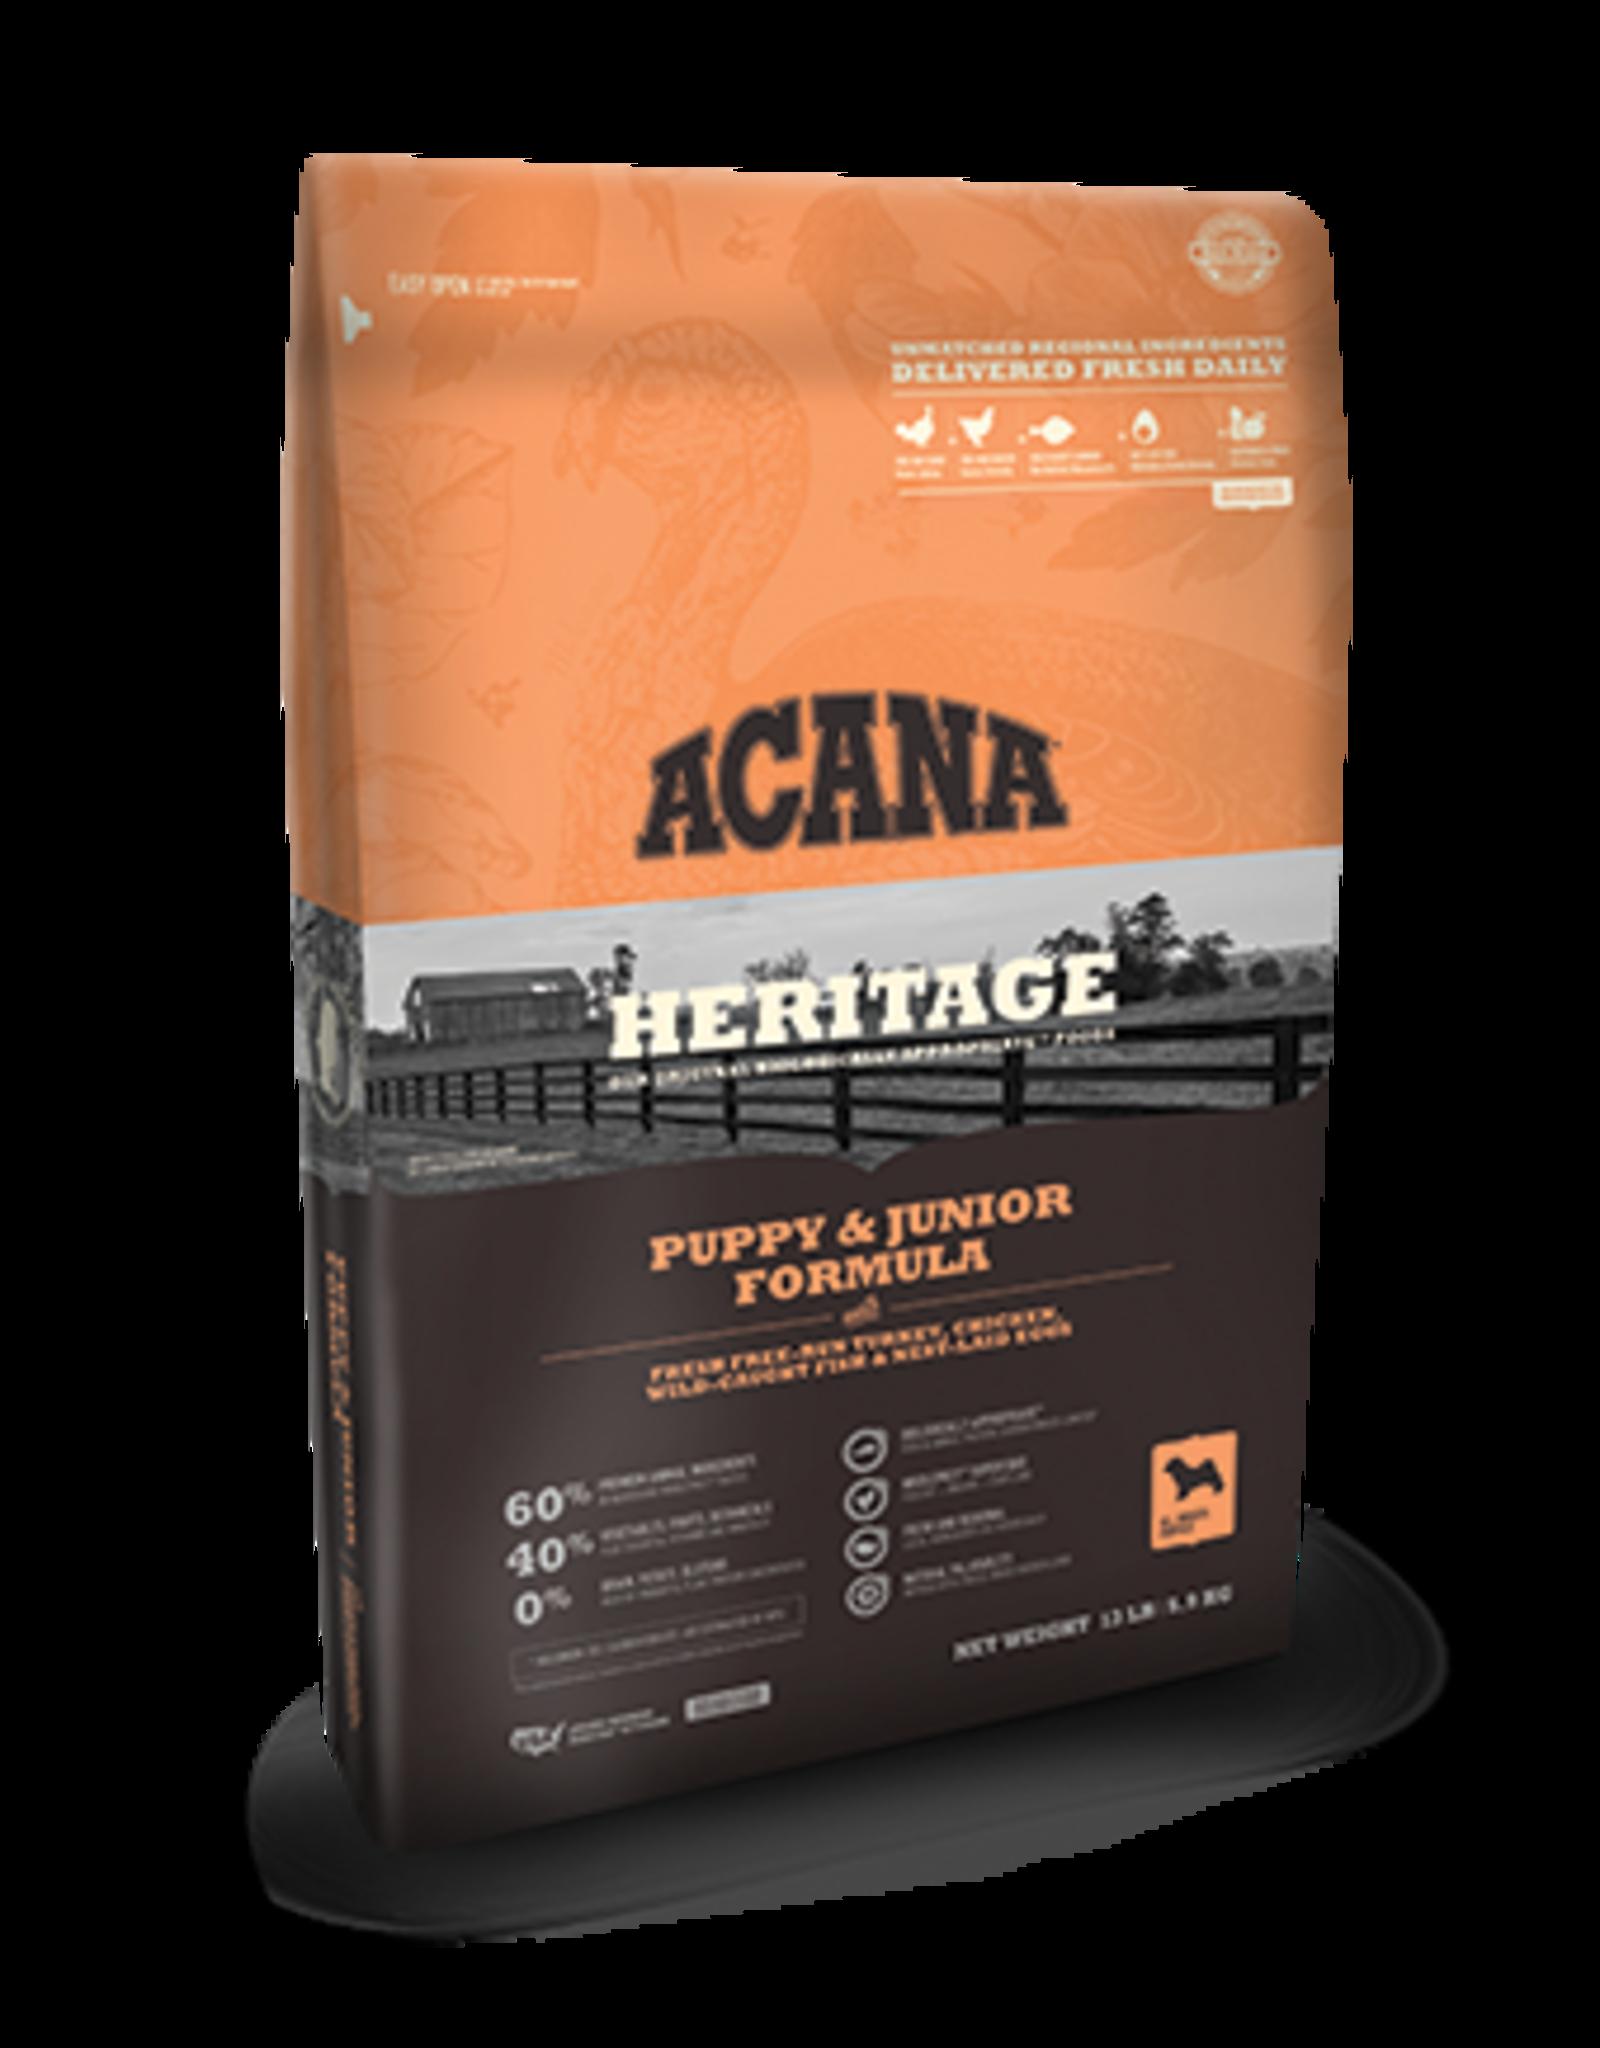 Acana Acana Heritage Dog Food Puppy & Junior